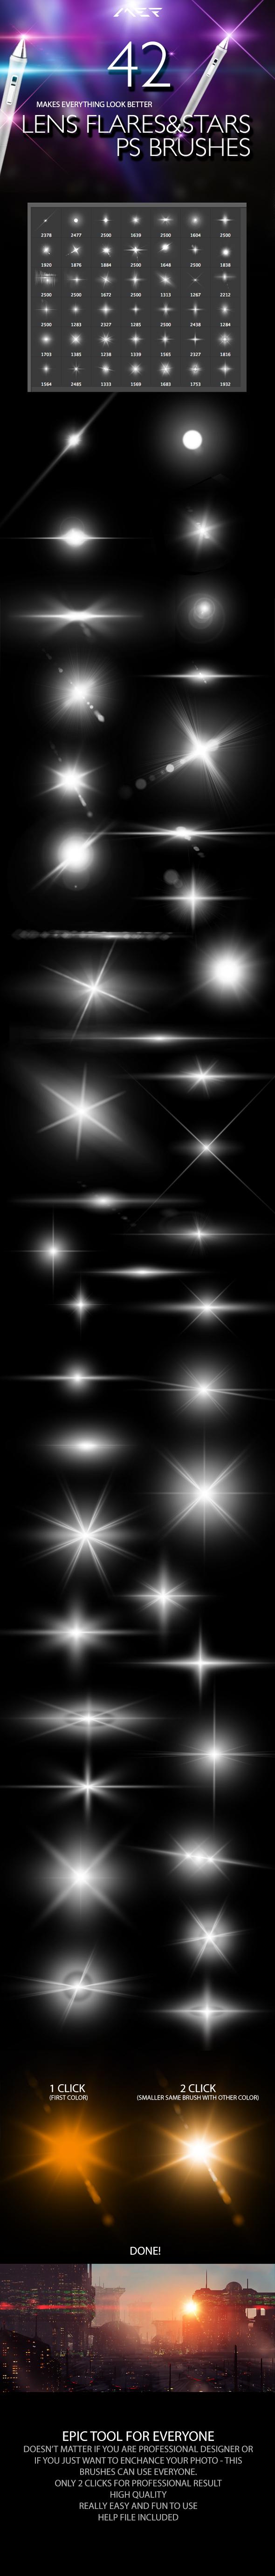 42 Lens Flares And Stars Photoshop Brushes